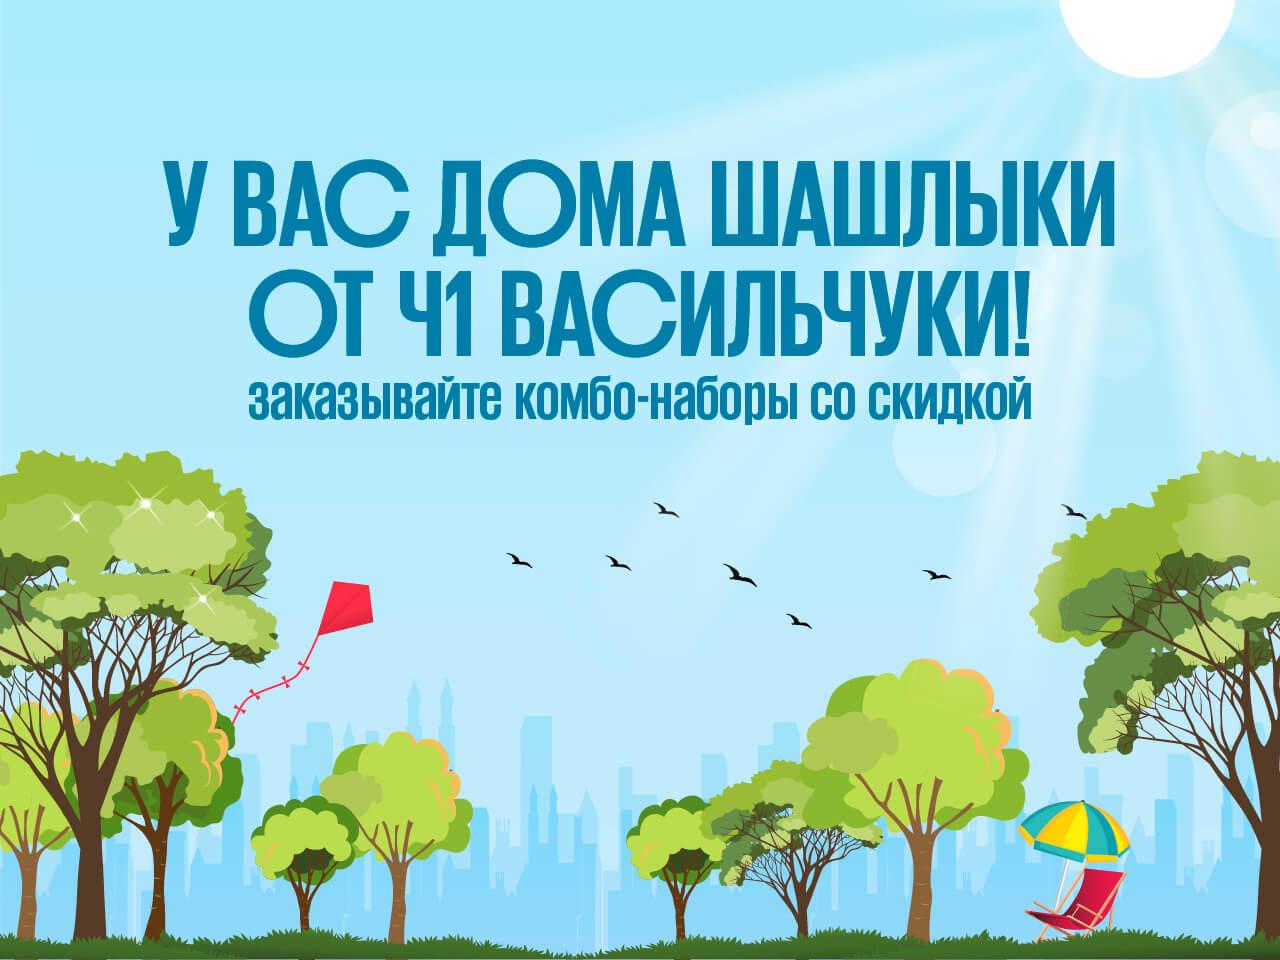 У вас дома шашлыки от Ч1 Васильчуки!